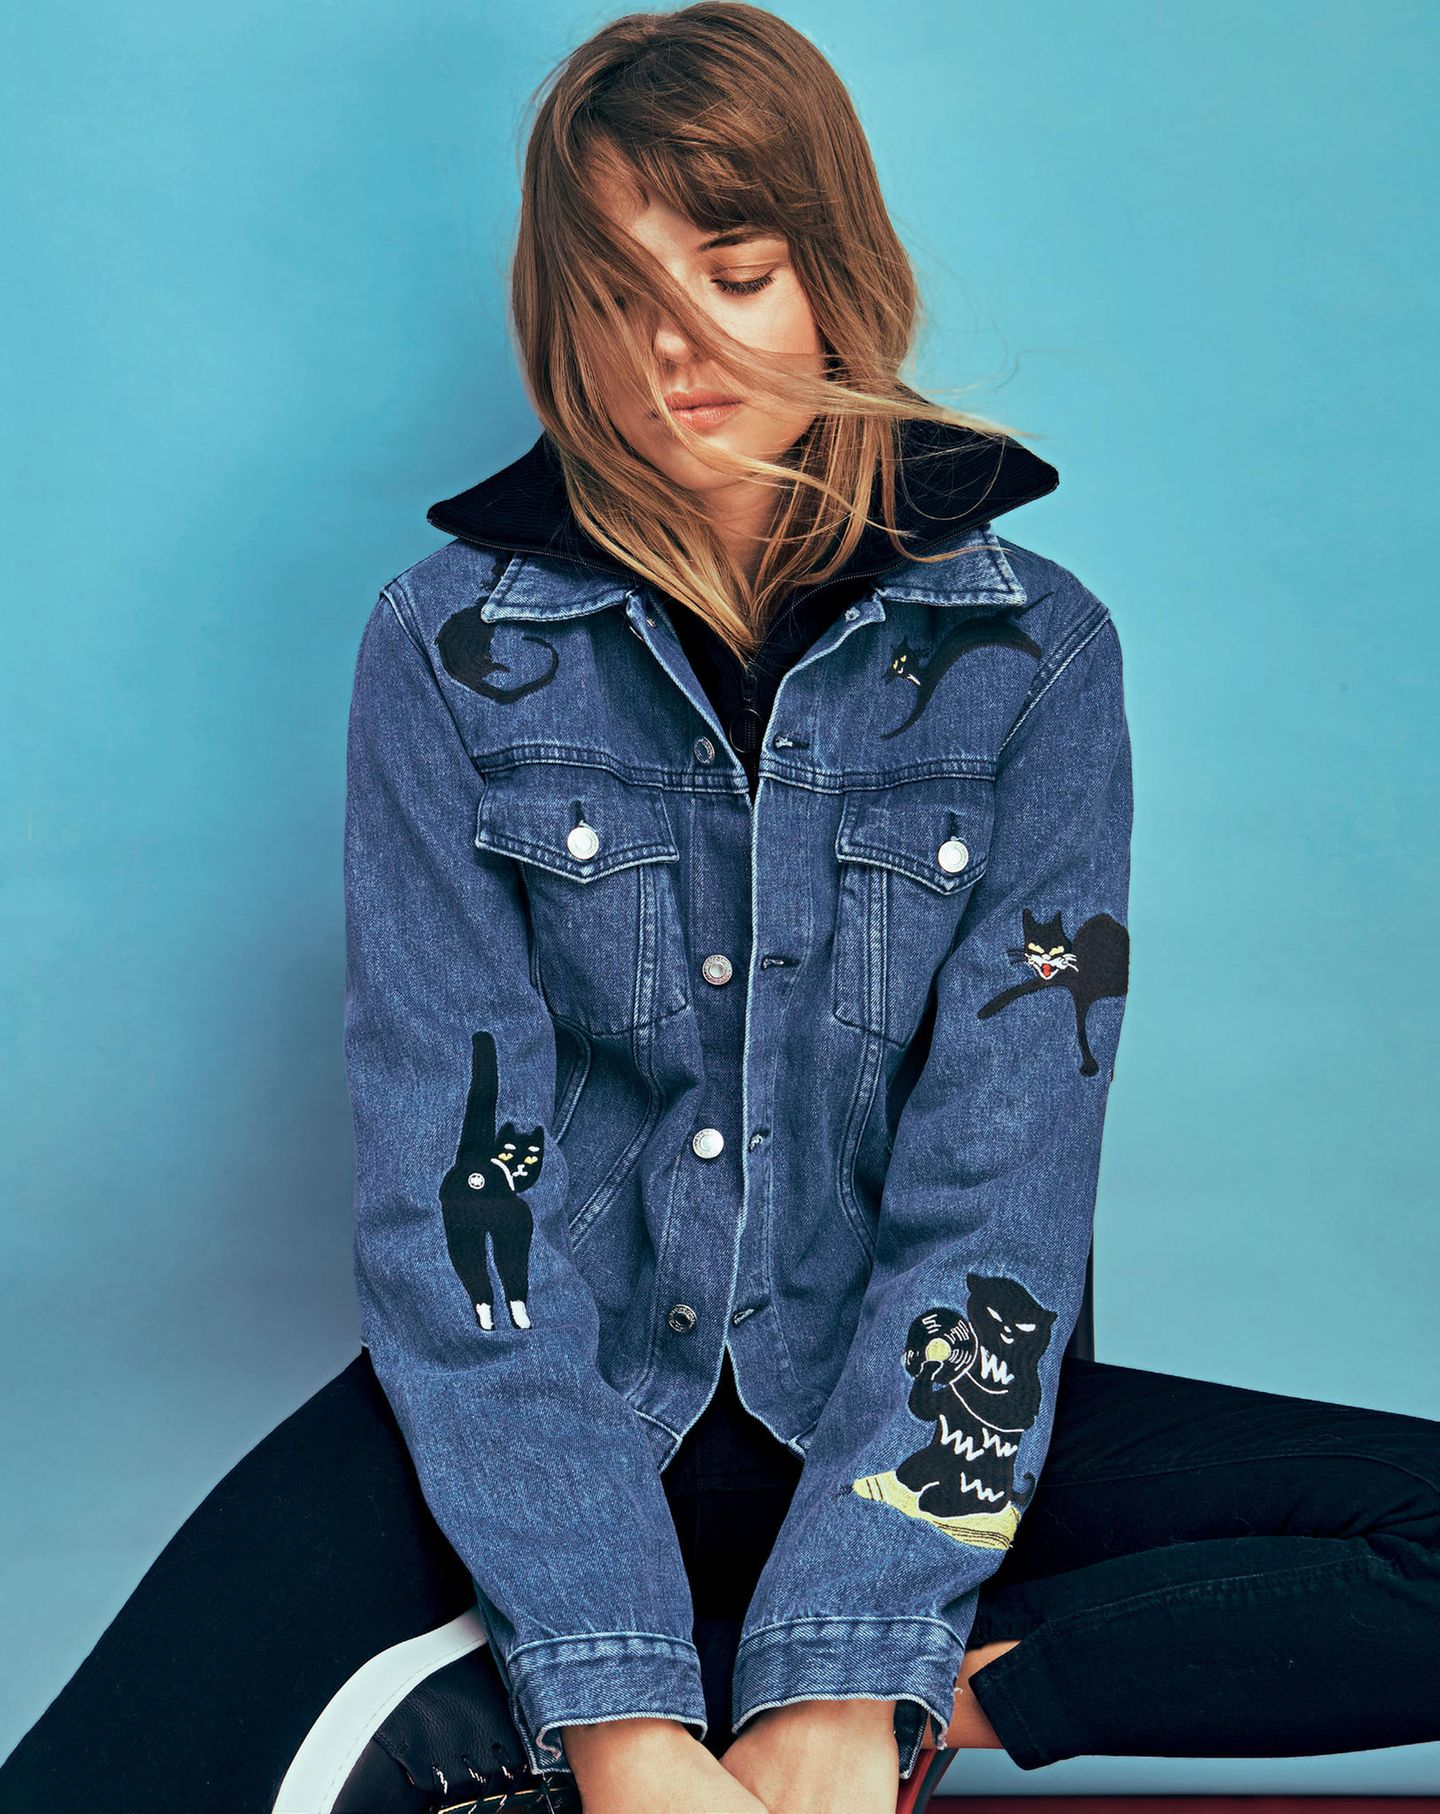 Frau trägt Jeansjacke mit Katzenpatches